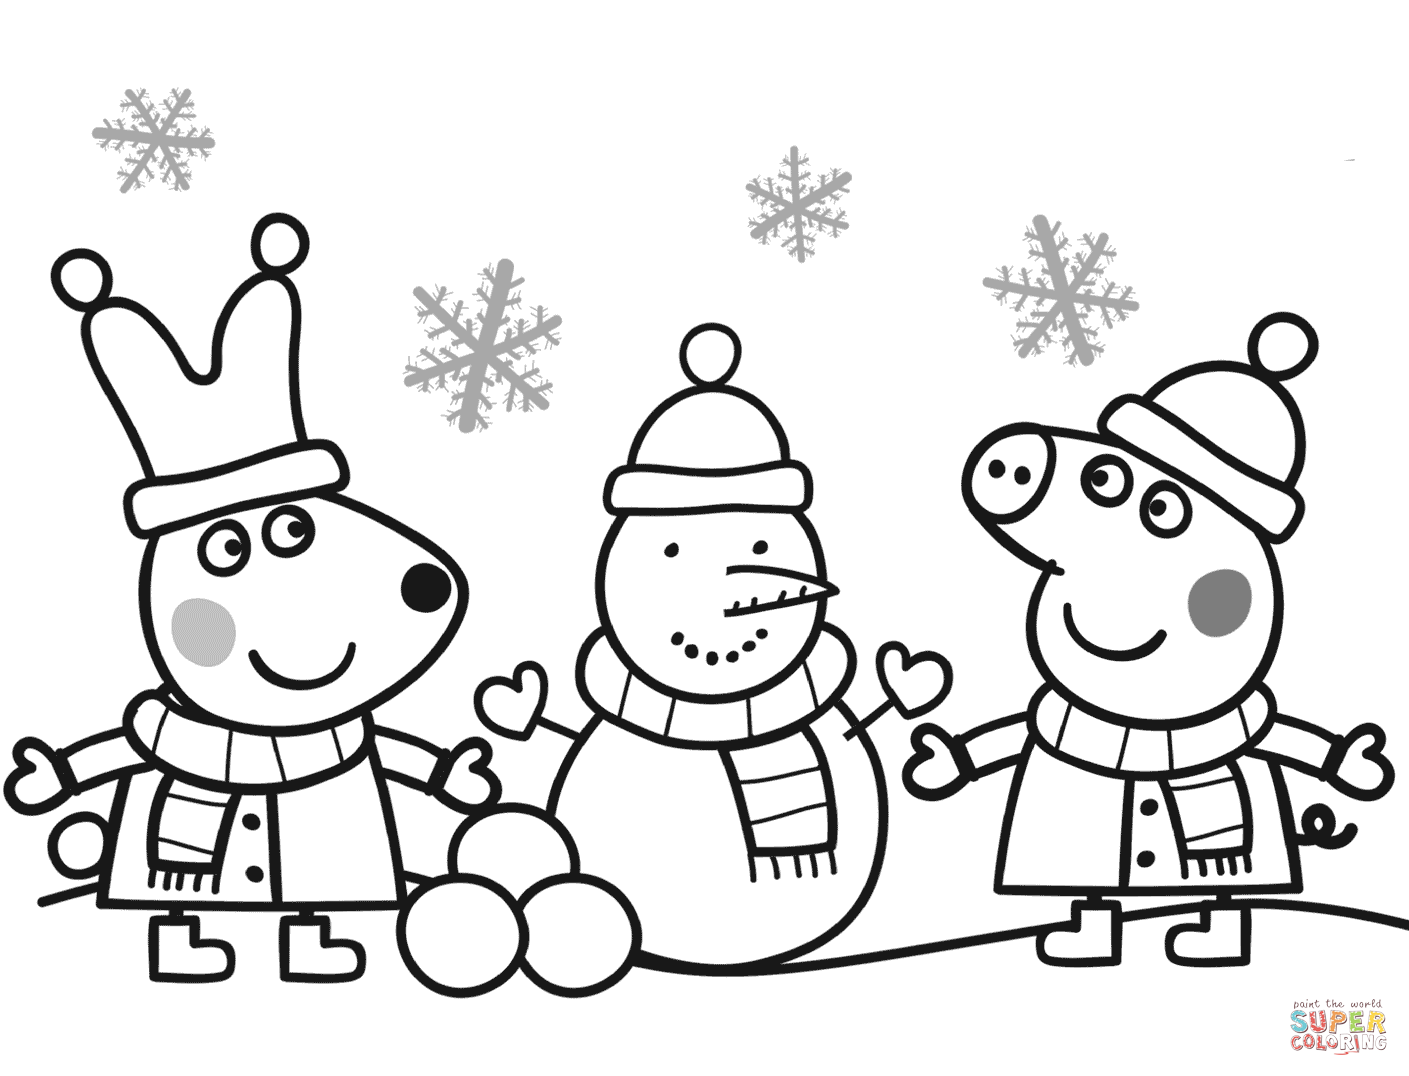 Peppa and rebecca are making snowman